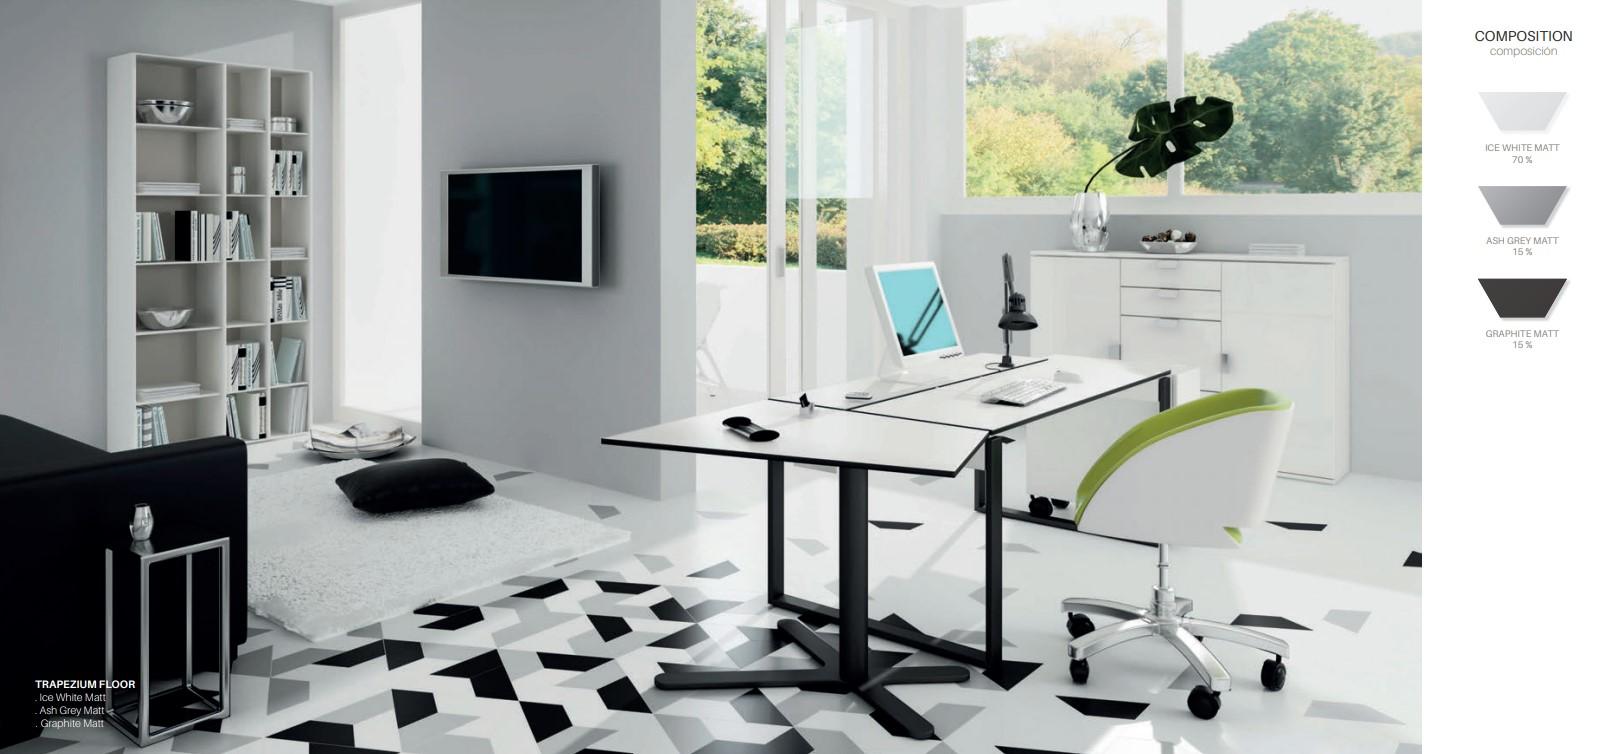 Floor Tiles Ice White, Graphite & Ash Grey Matte Trapezium